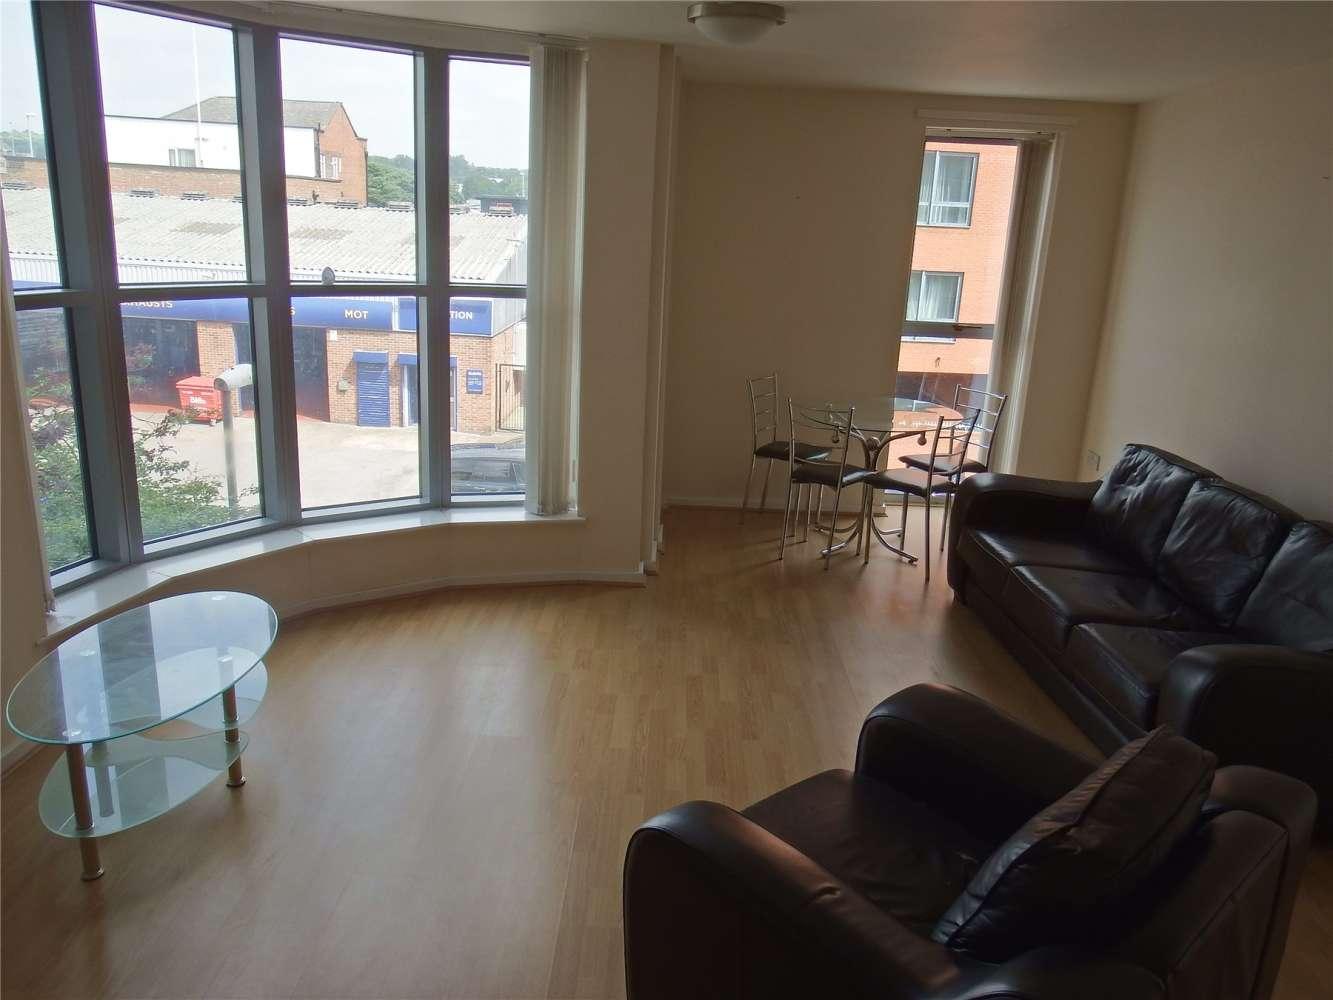 Apartment Leeds, LS2 - Ahlux Court Millwright Street Leeds West Yorkshire - 05